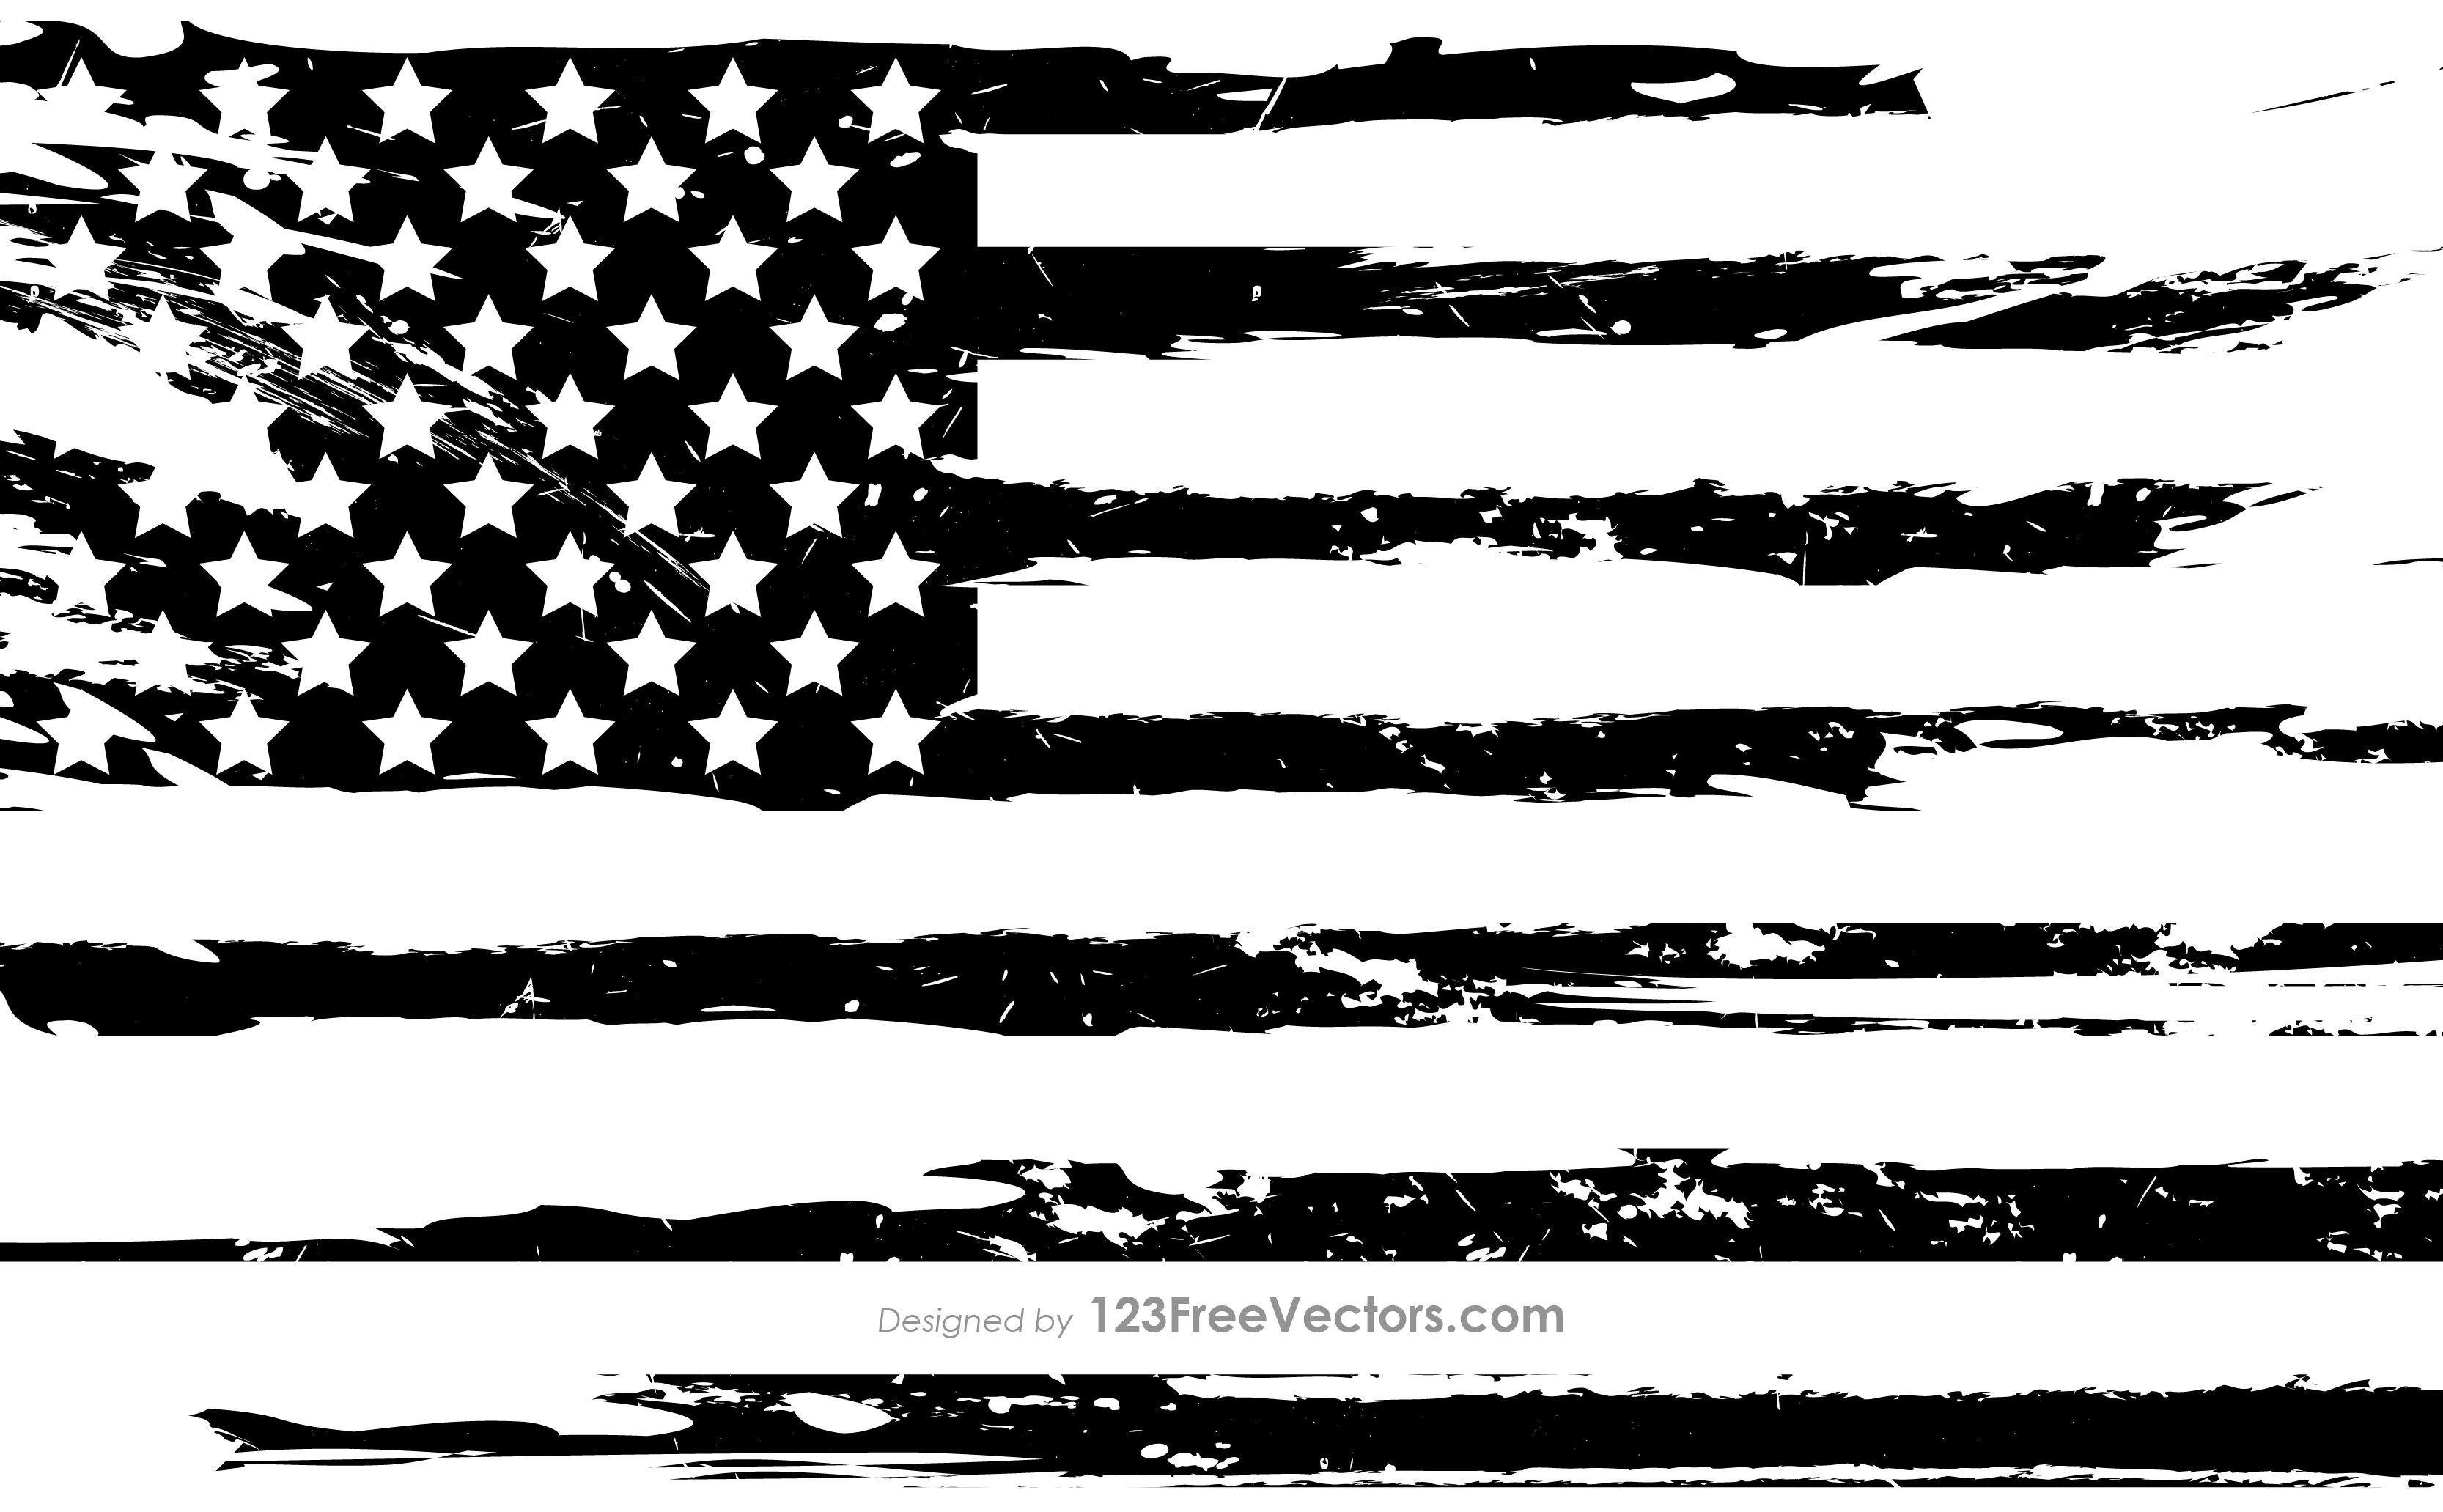 American Flag Clipart Black And White Images In 2021 American Flag Photography Black And White Flag American Flag Art